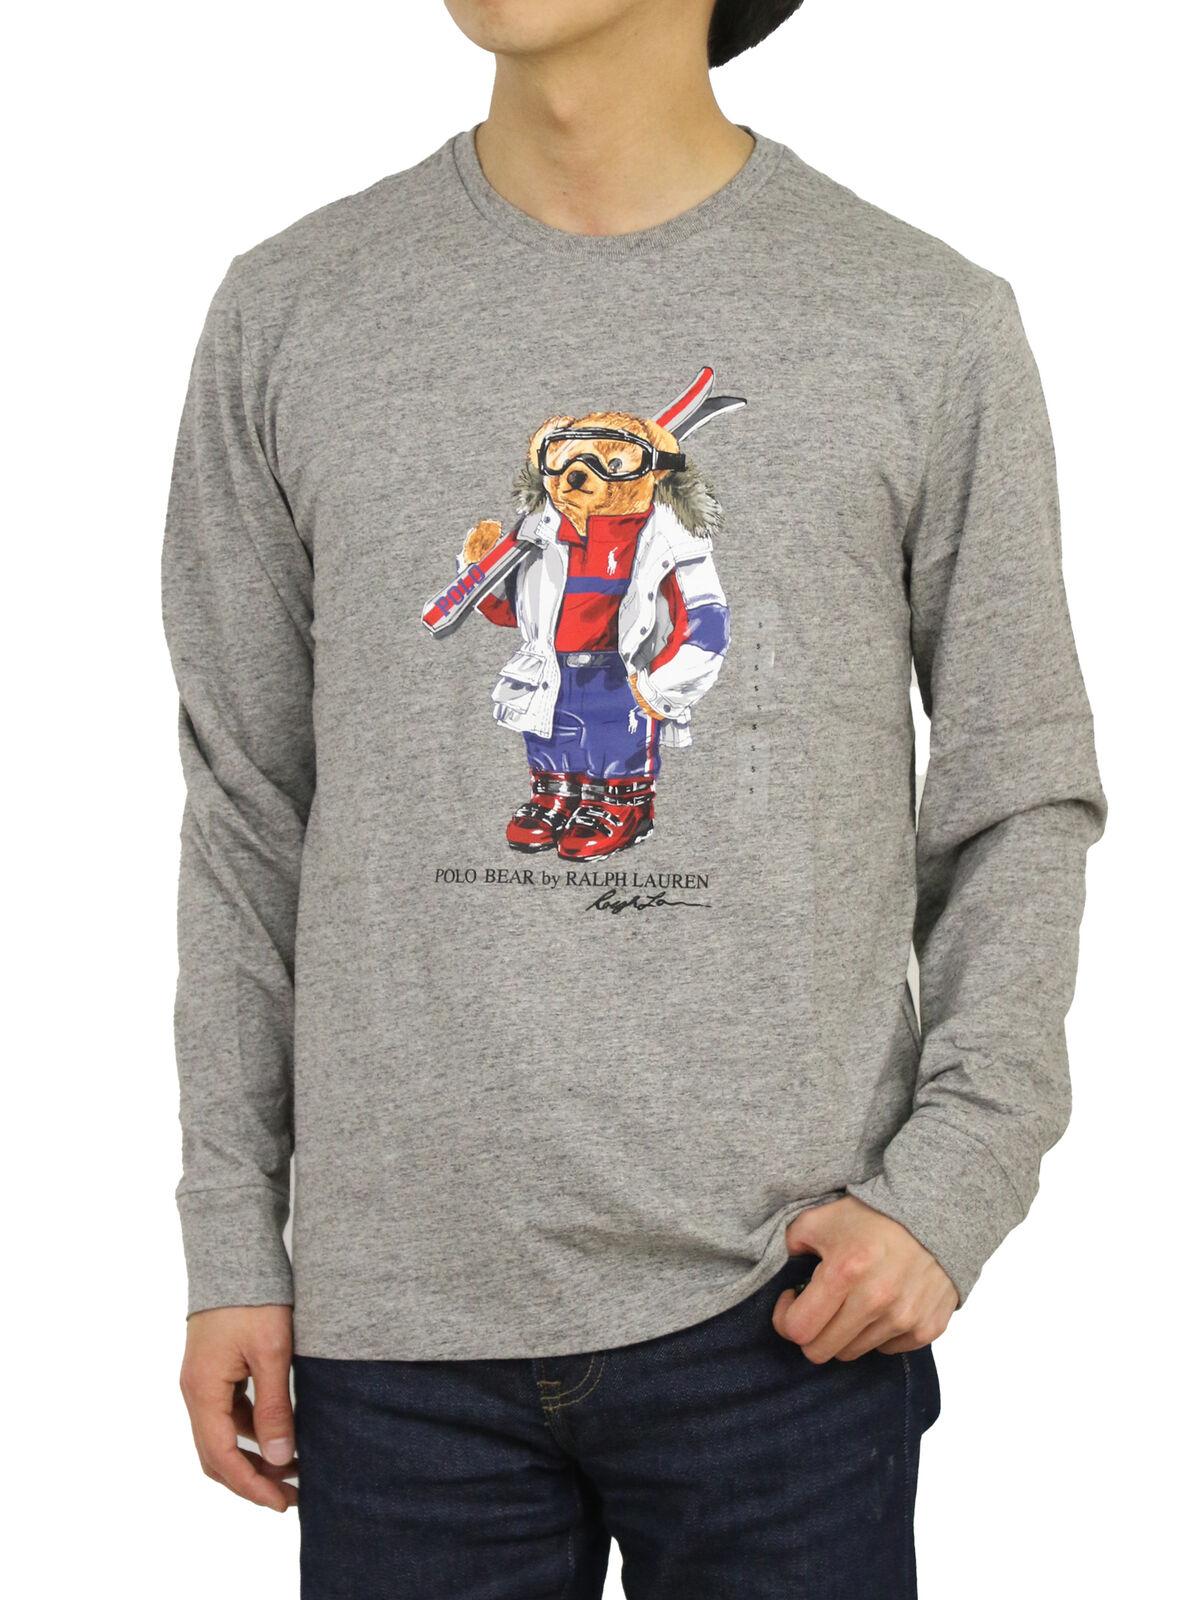 Ralph Lauren Mens Long Sleeve Tshirt Polo Bear Limited Edition Size XXL -